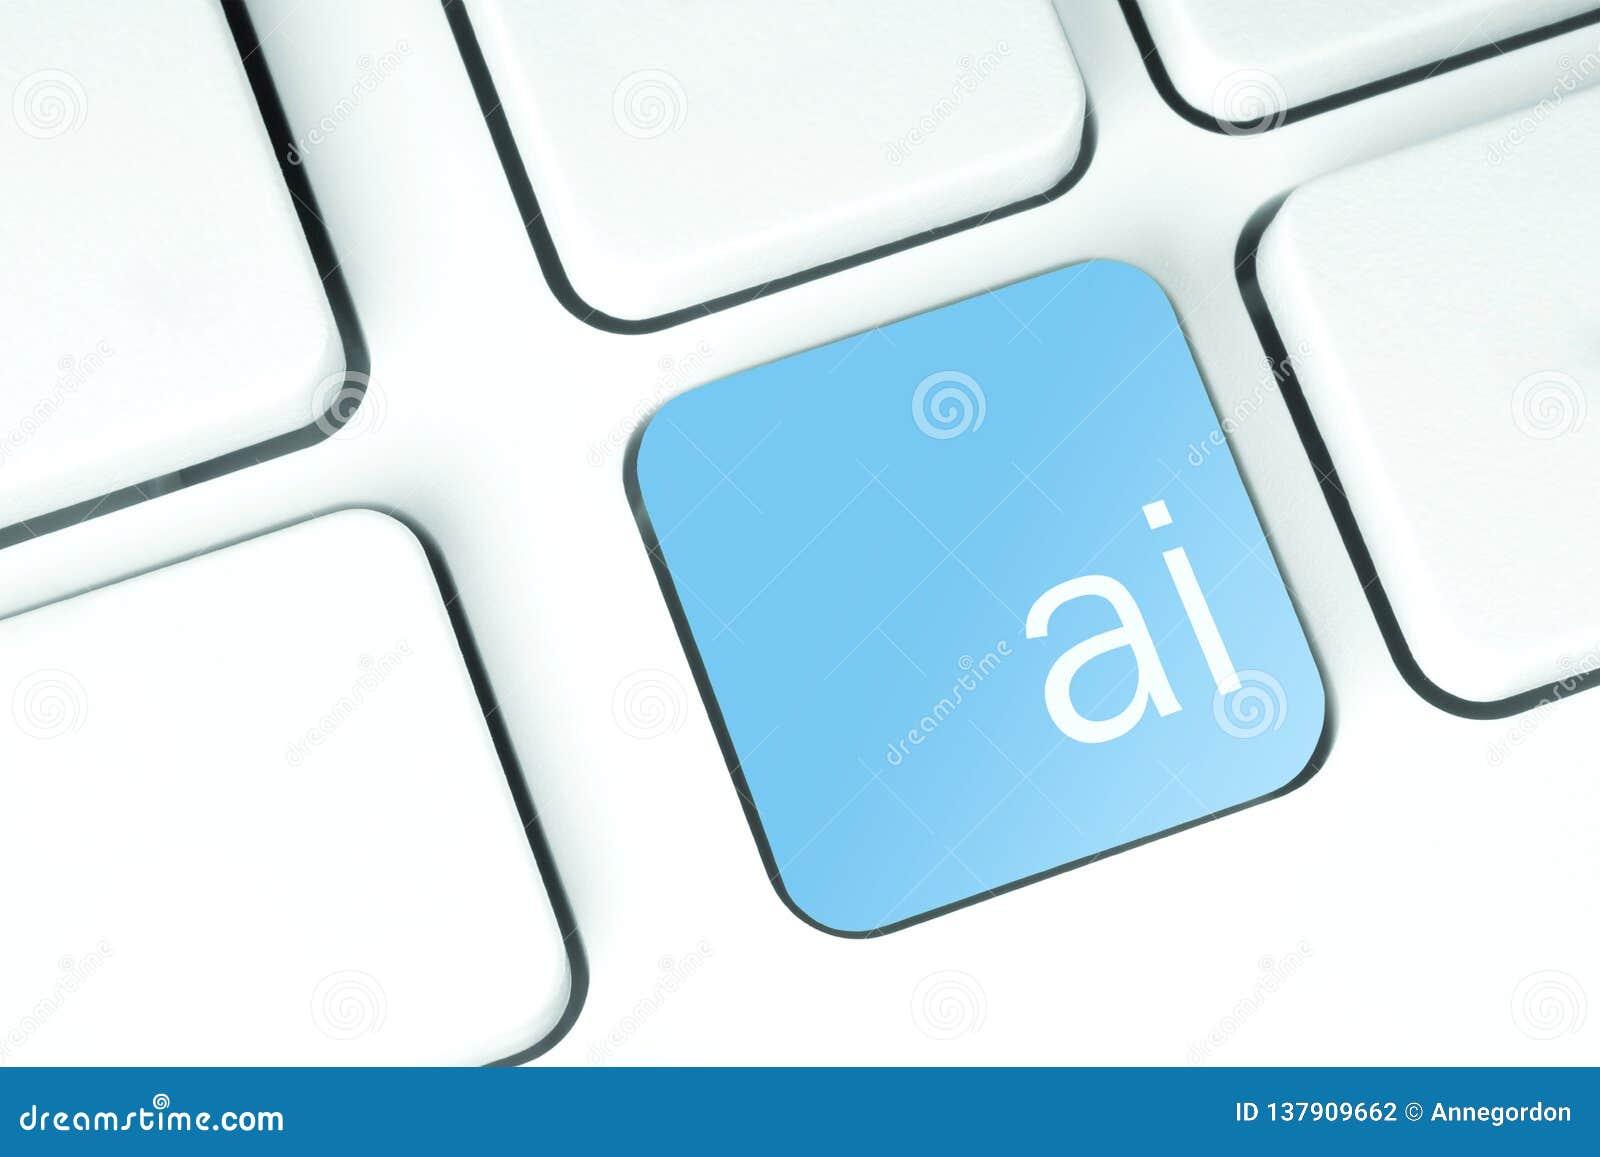 Artificial Intelligence Button on keyboard